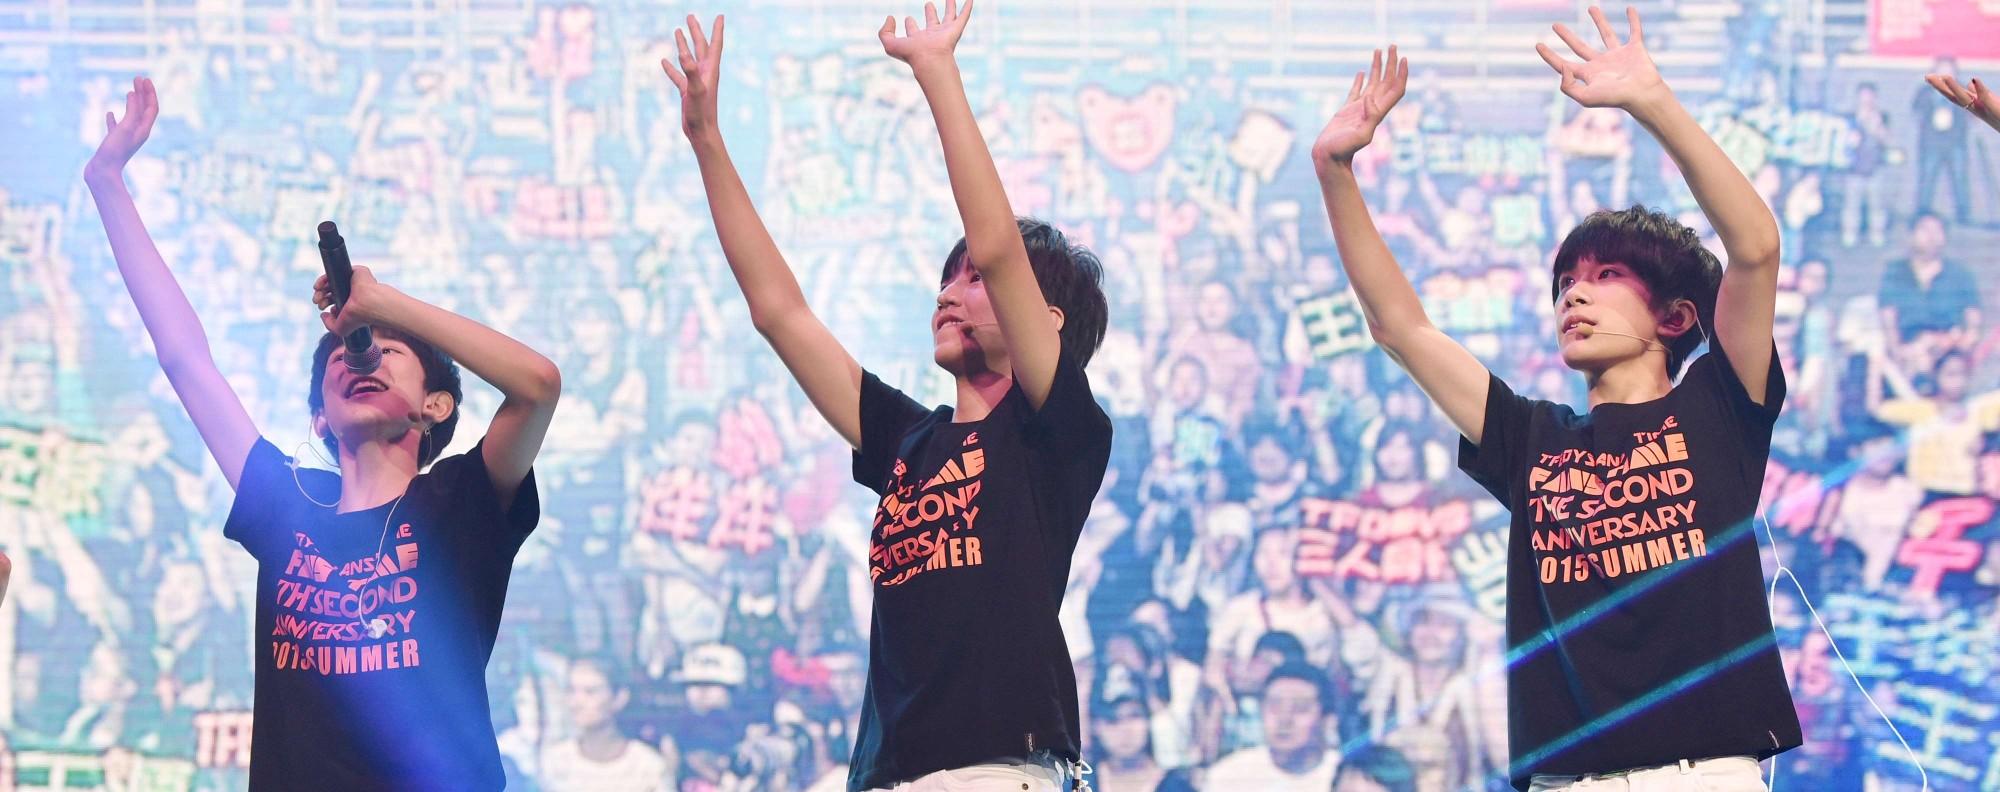 TFBoys perform in Beijing. Photo: Handout